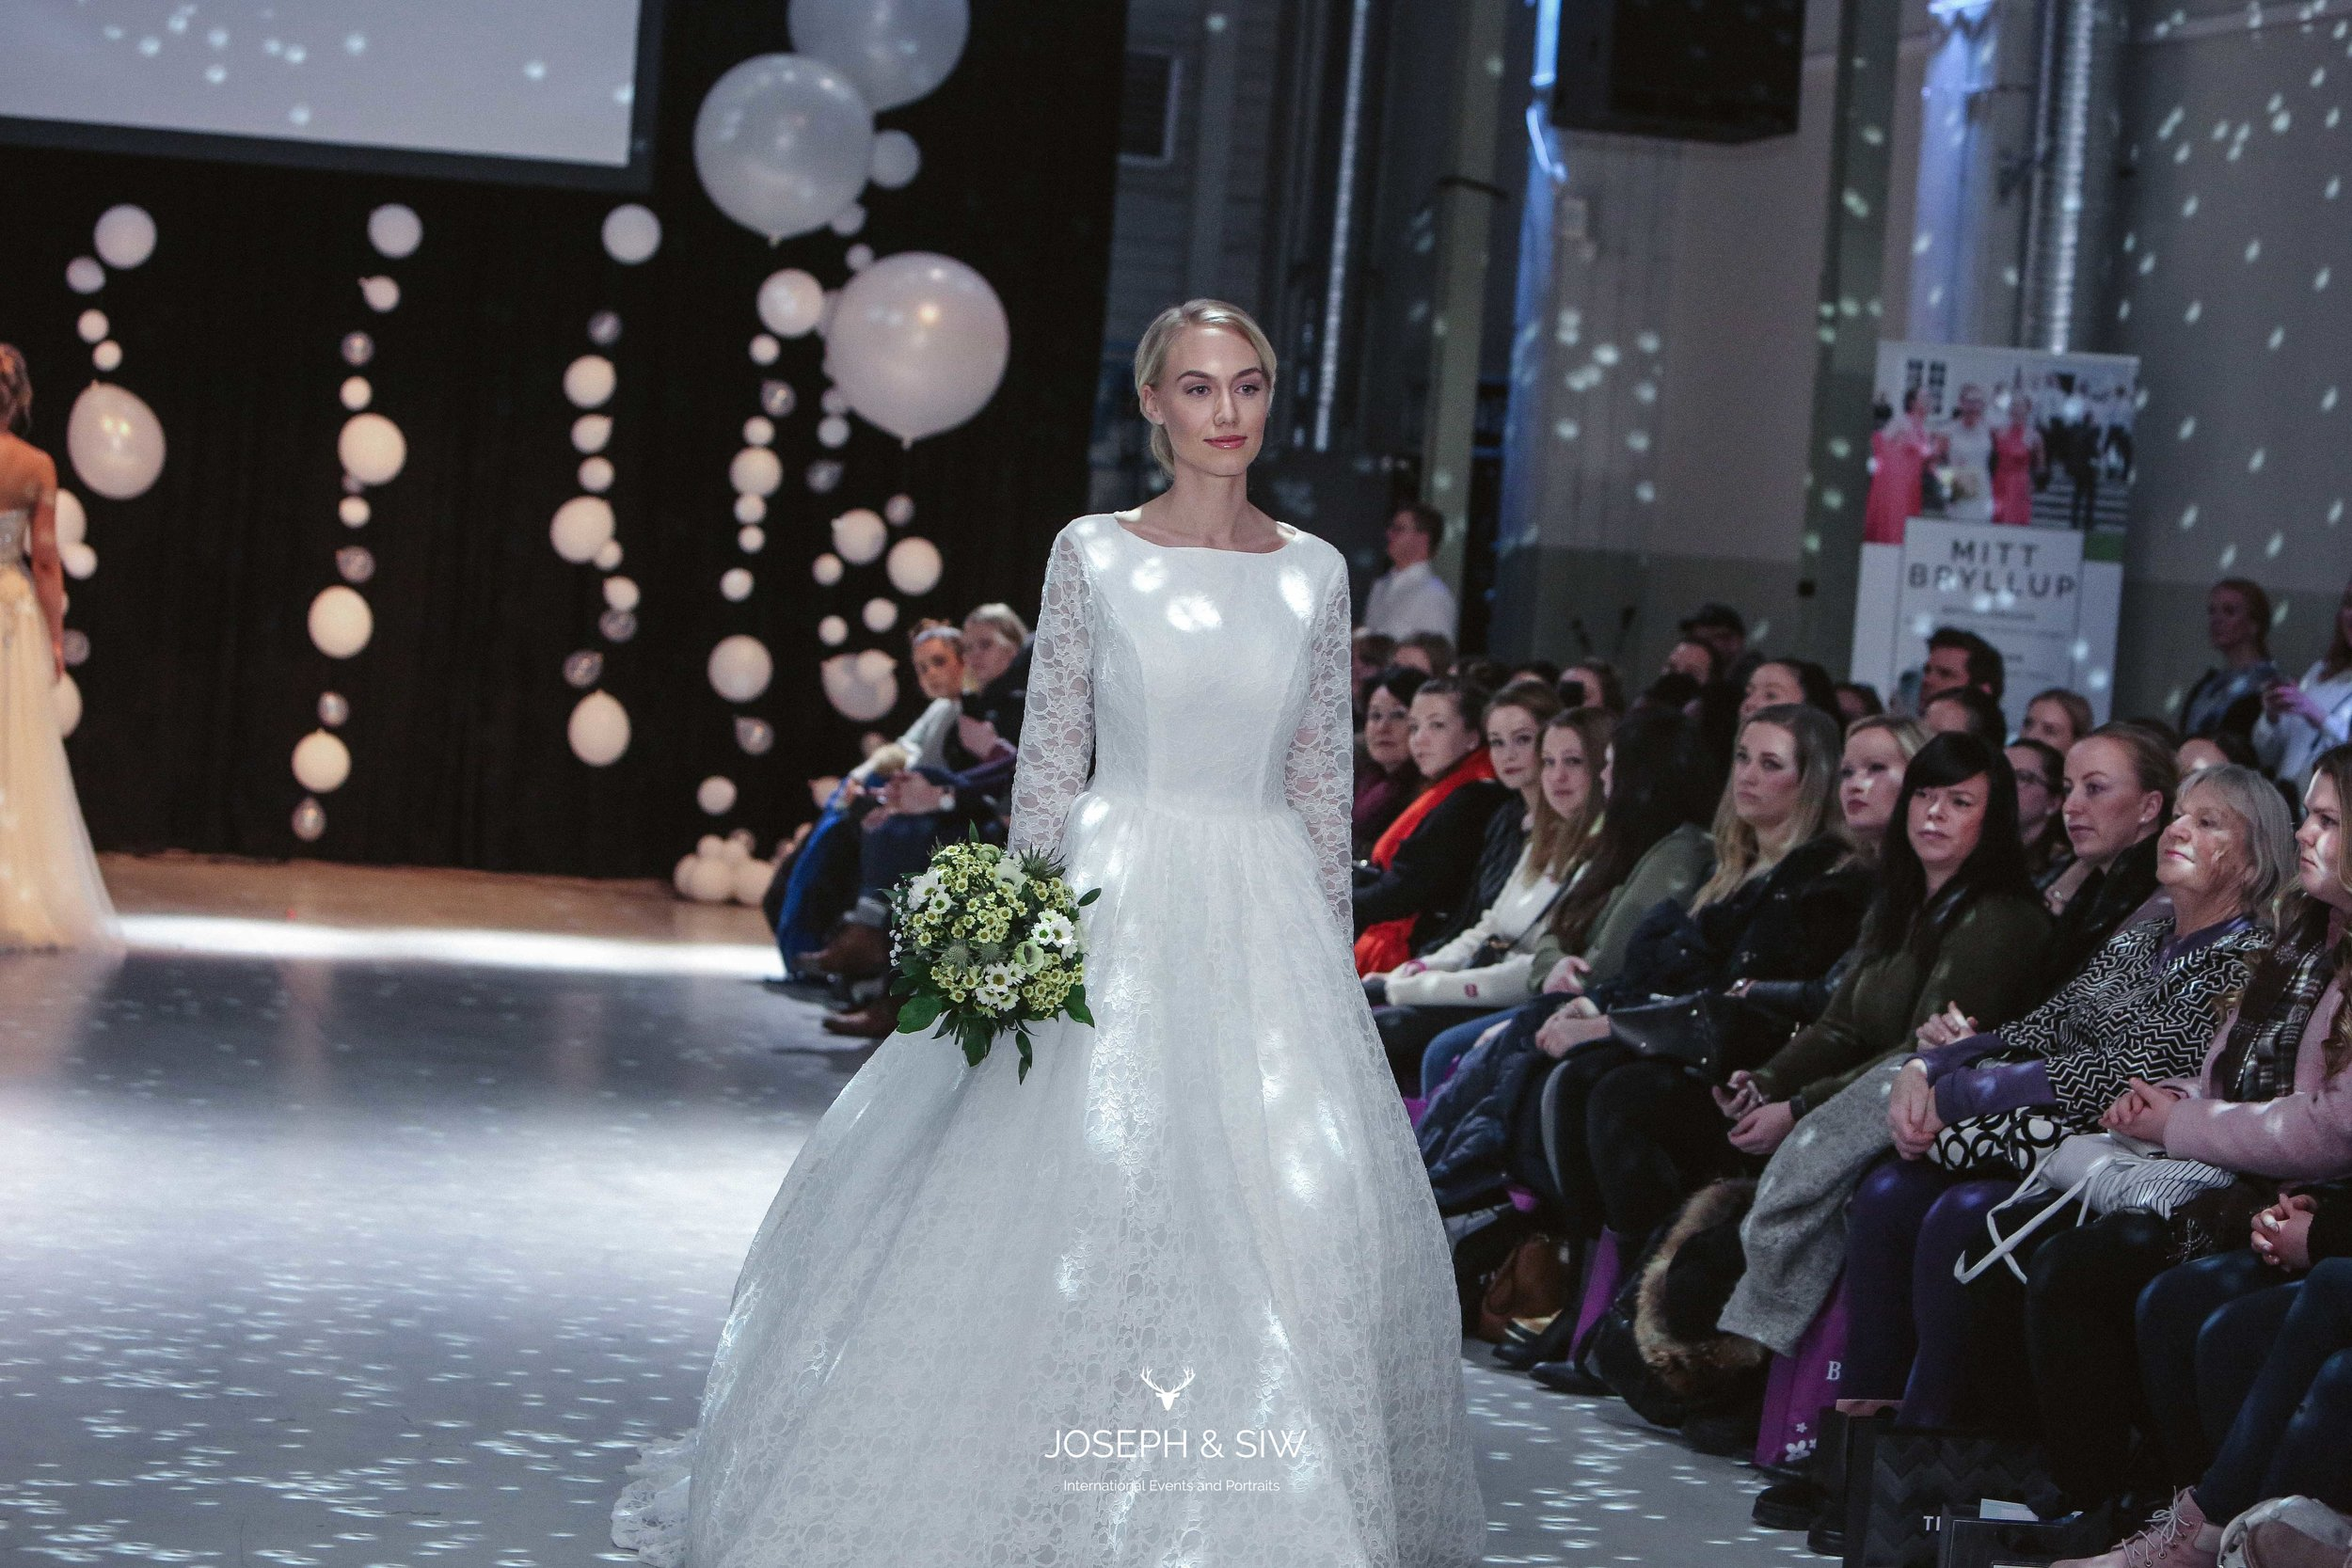 mittbryllup_bryllupsmesse_i_oslo_206.jpg